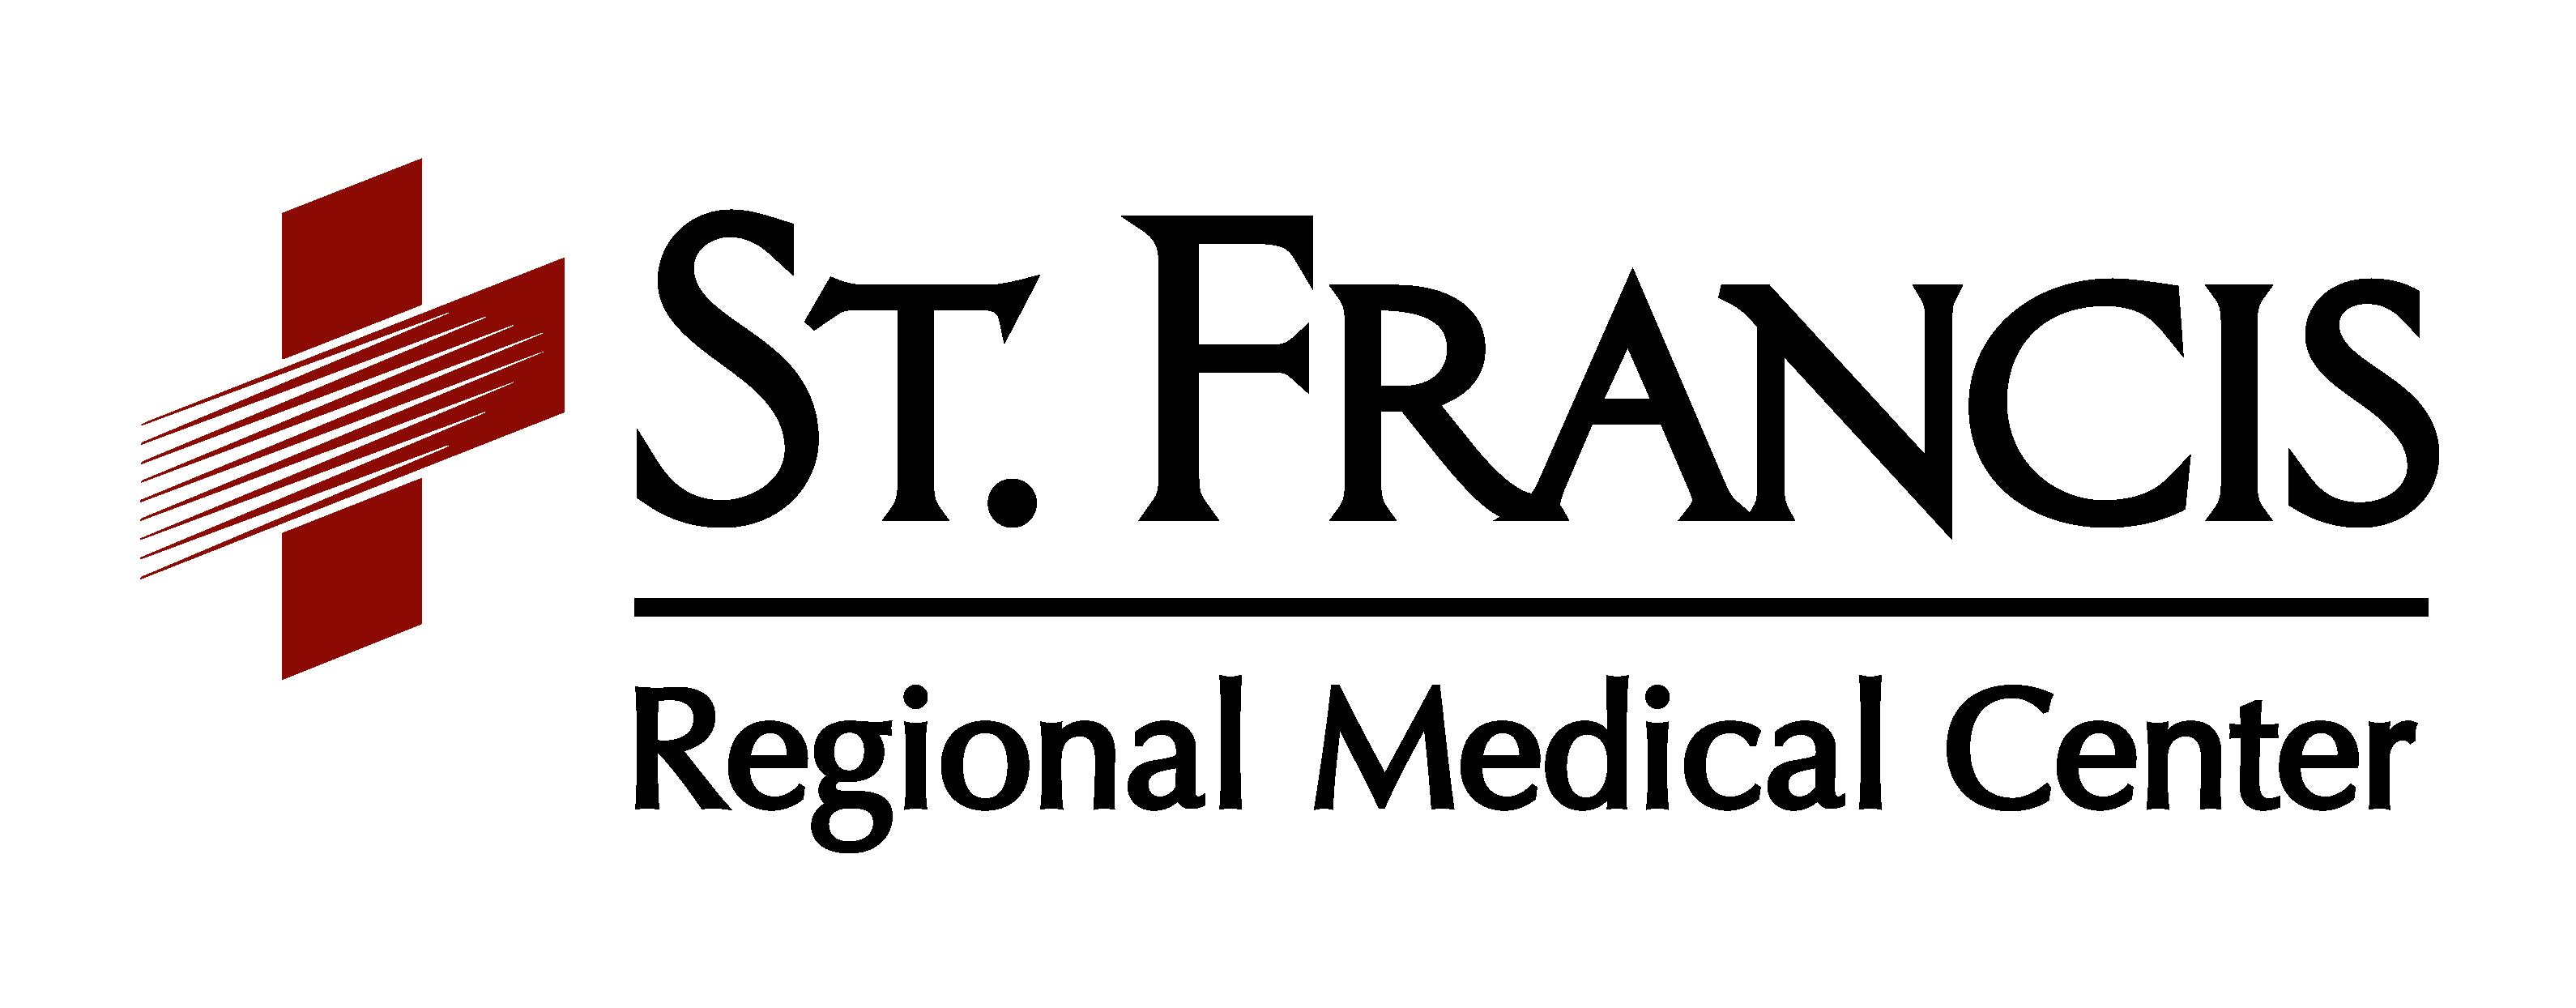 St. Francis Regional  Medical Center Company Logo